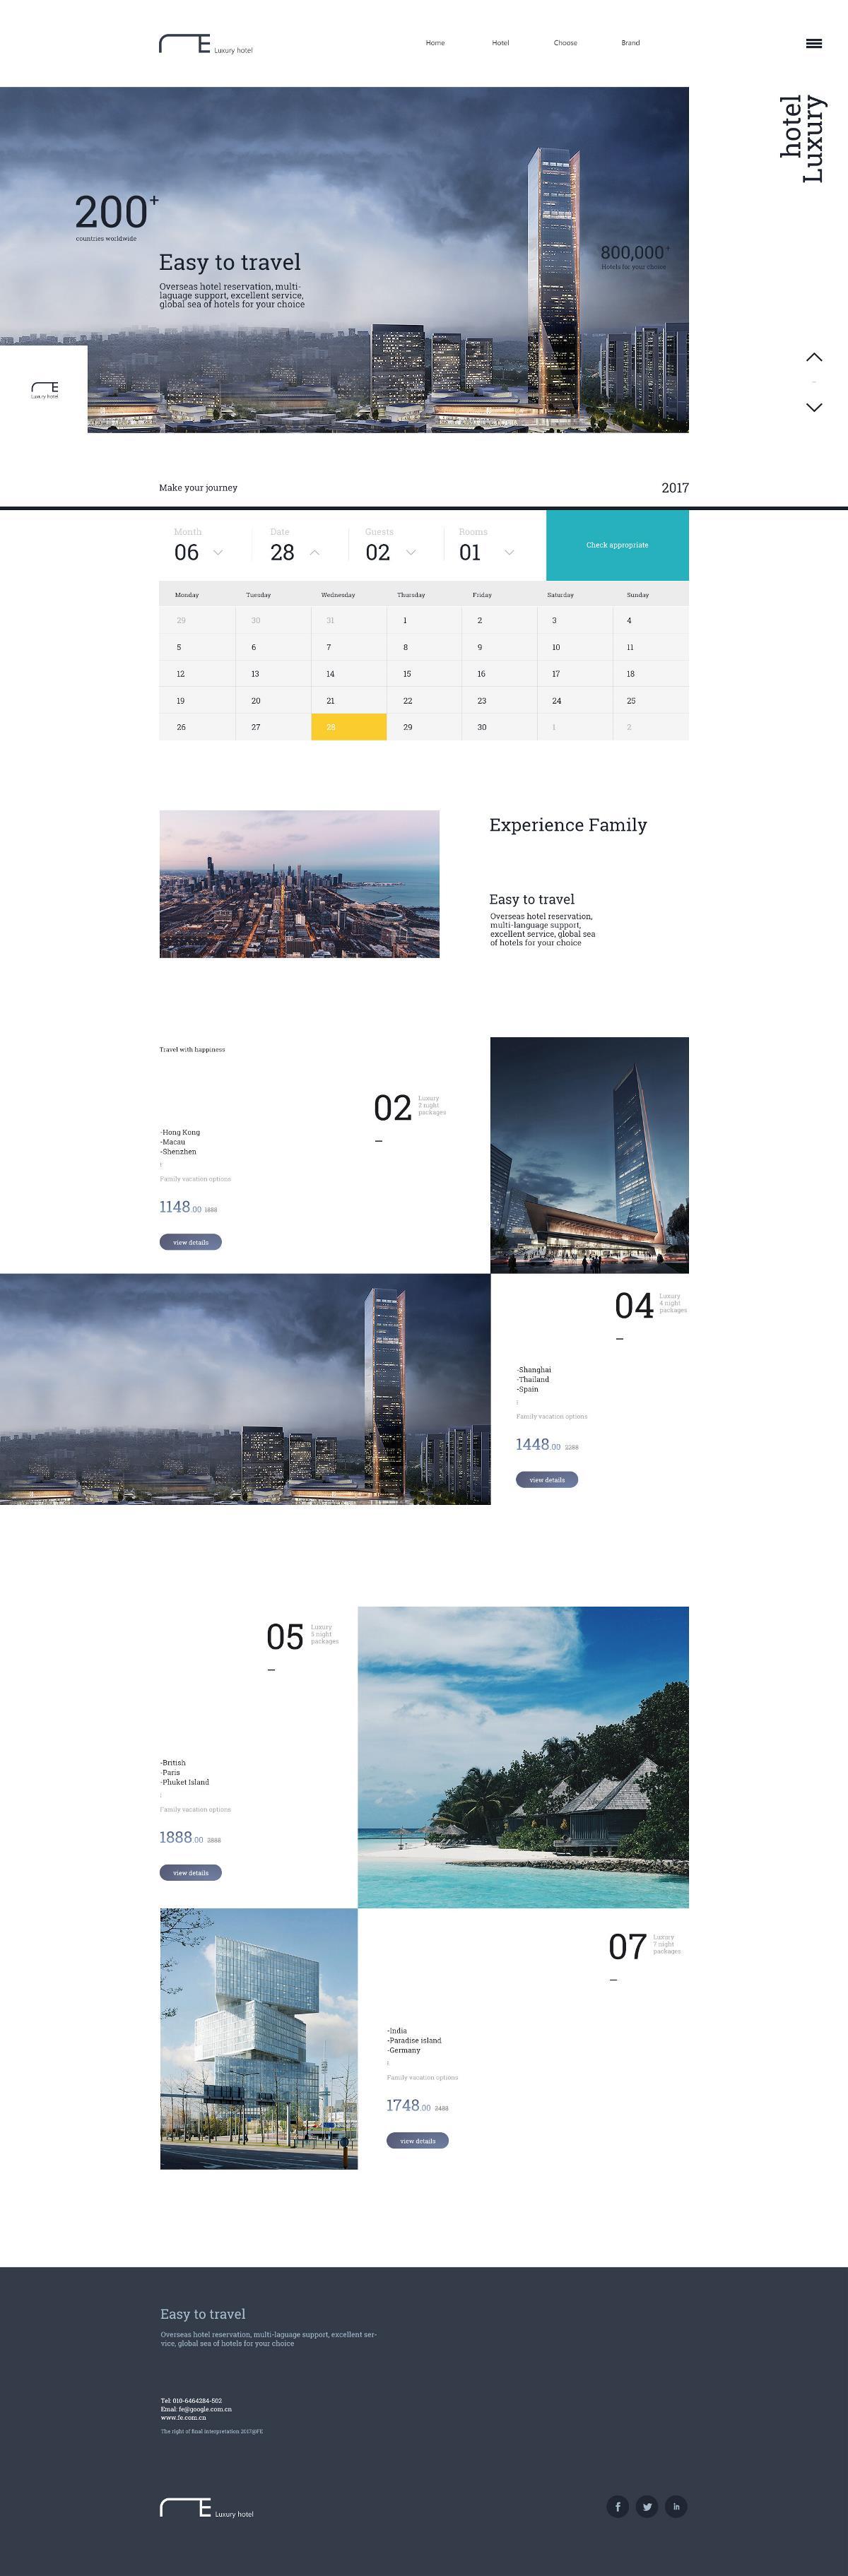 FE Hotel企业网站设计